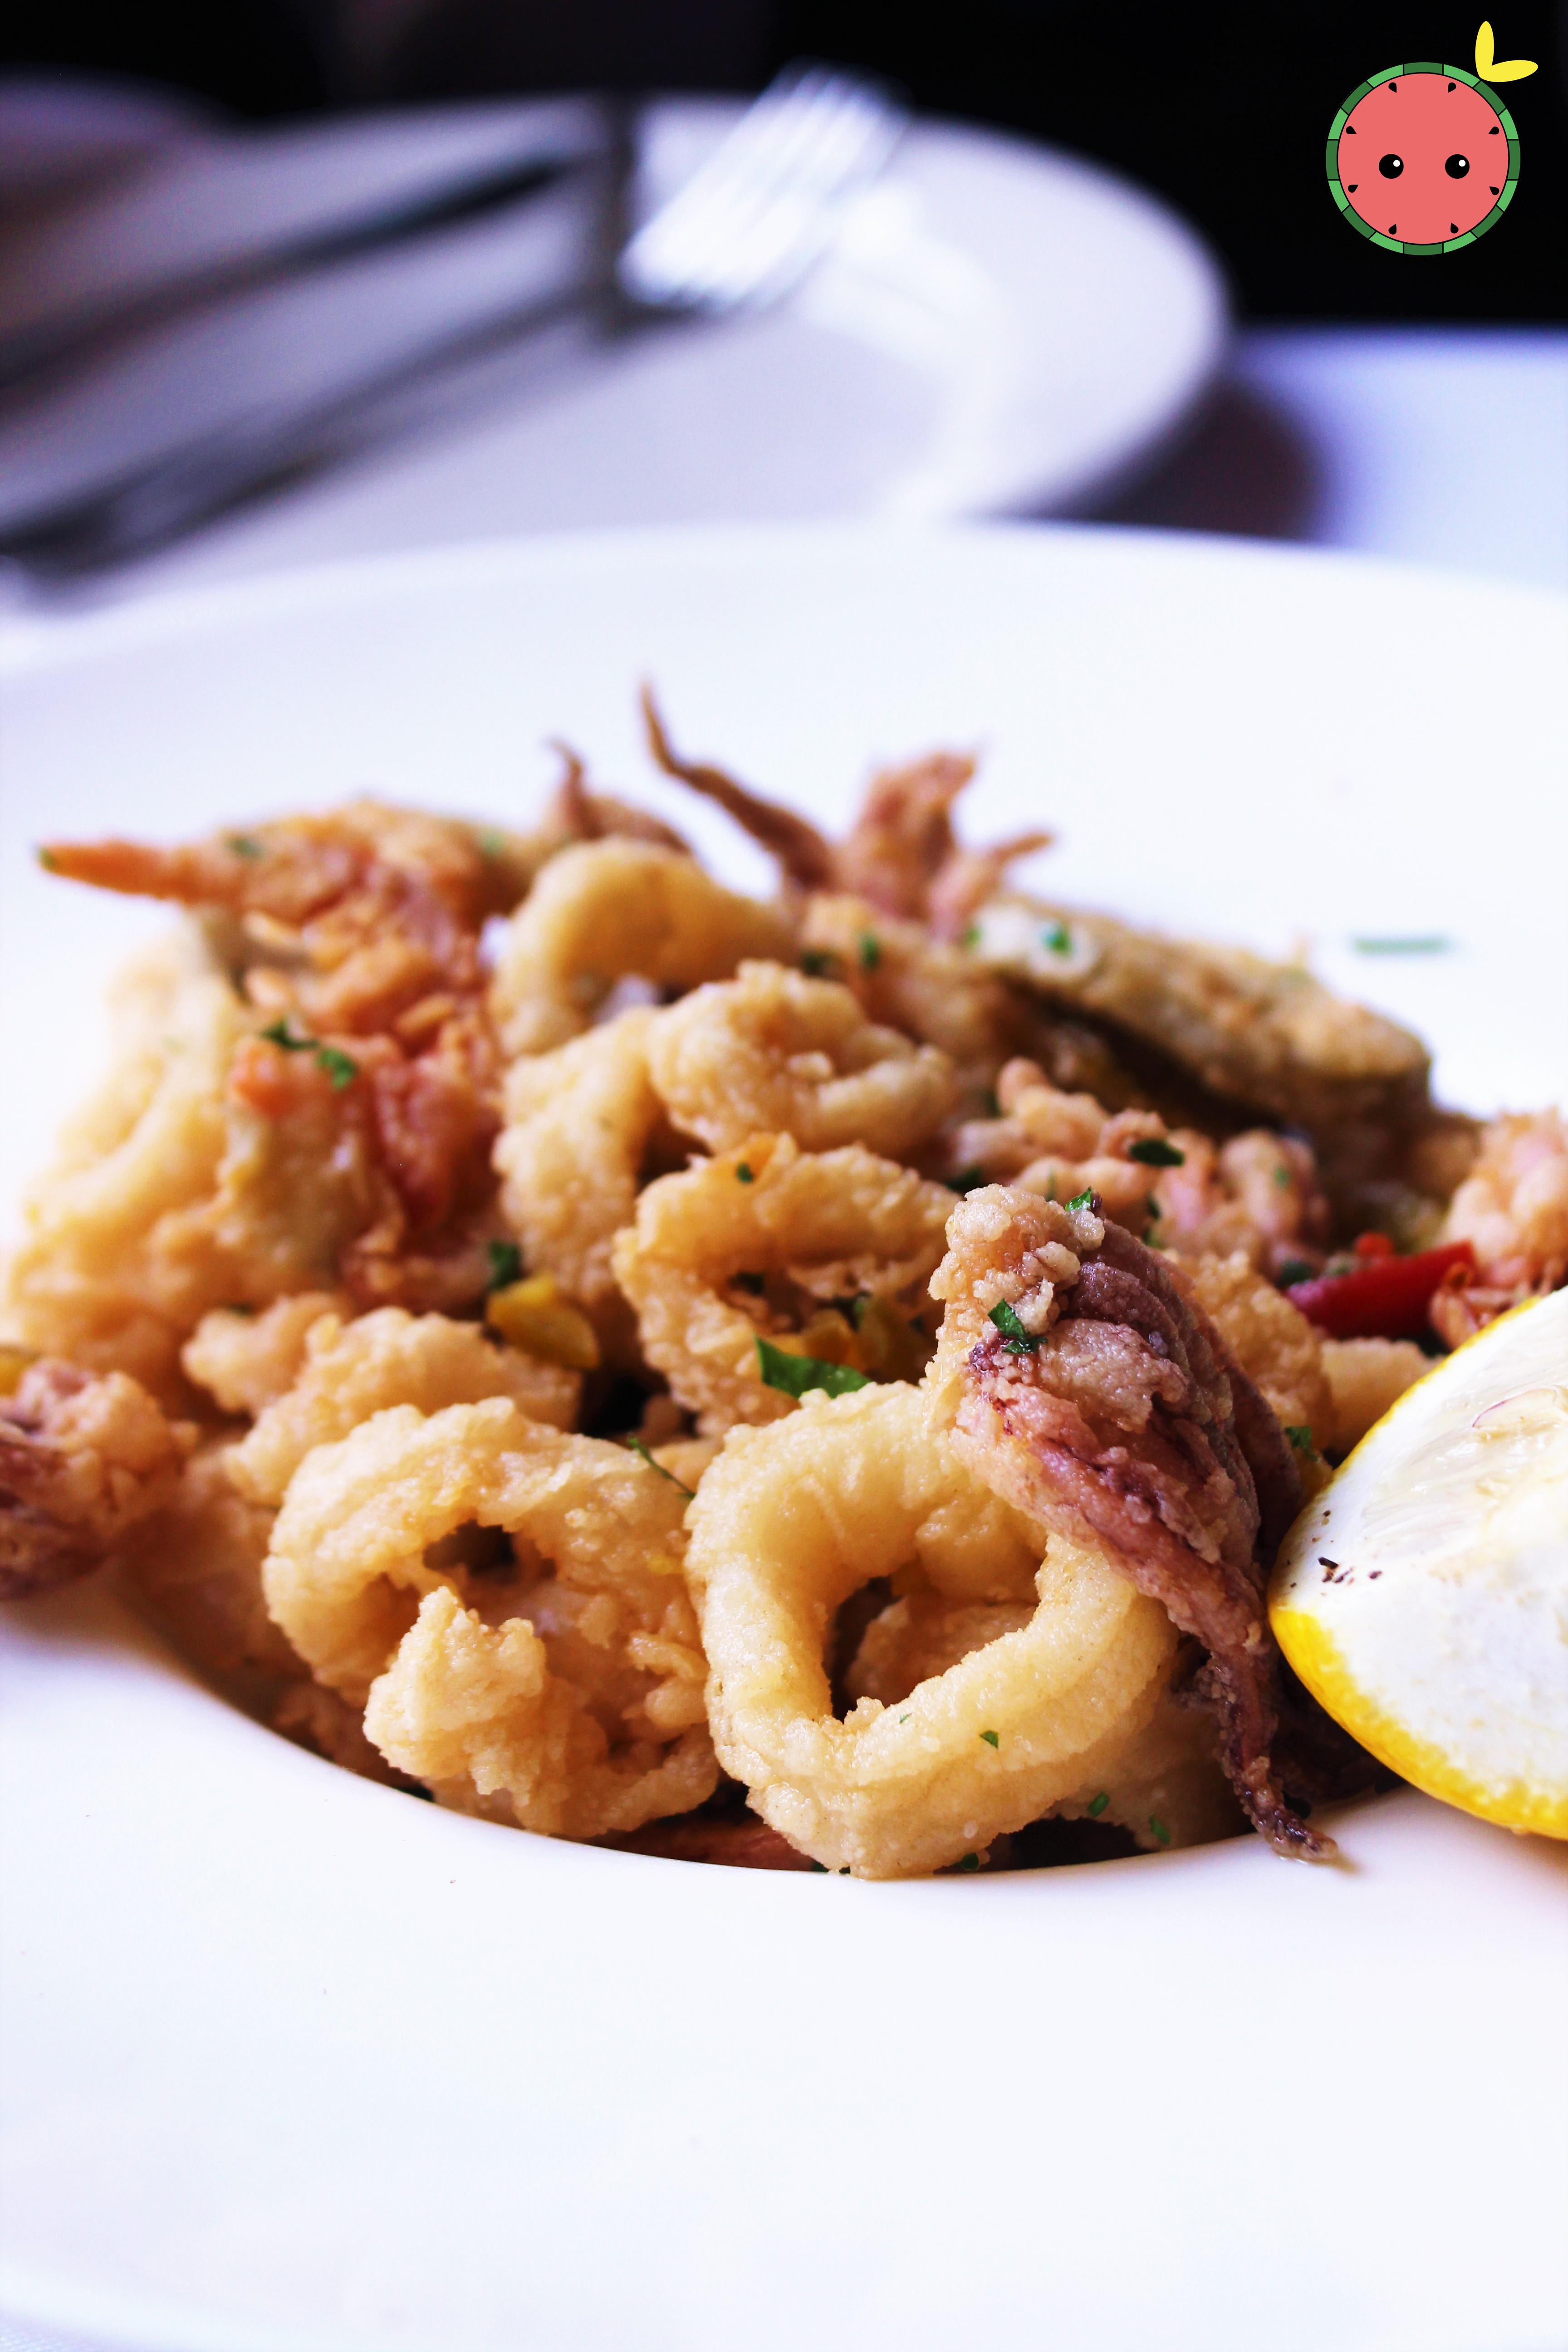 Calamari Salad with Olives, Garlic, Lemon, & Giardiniera